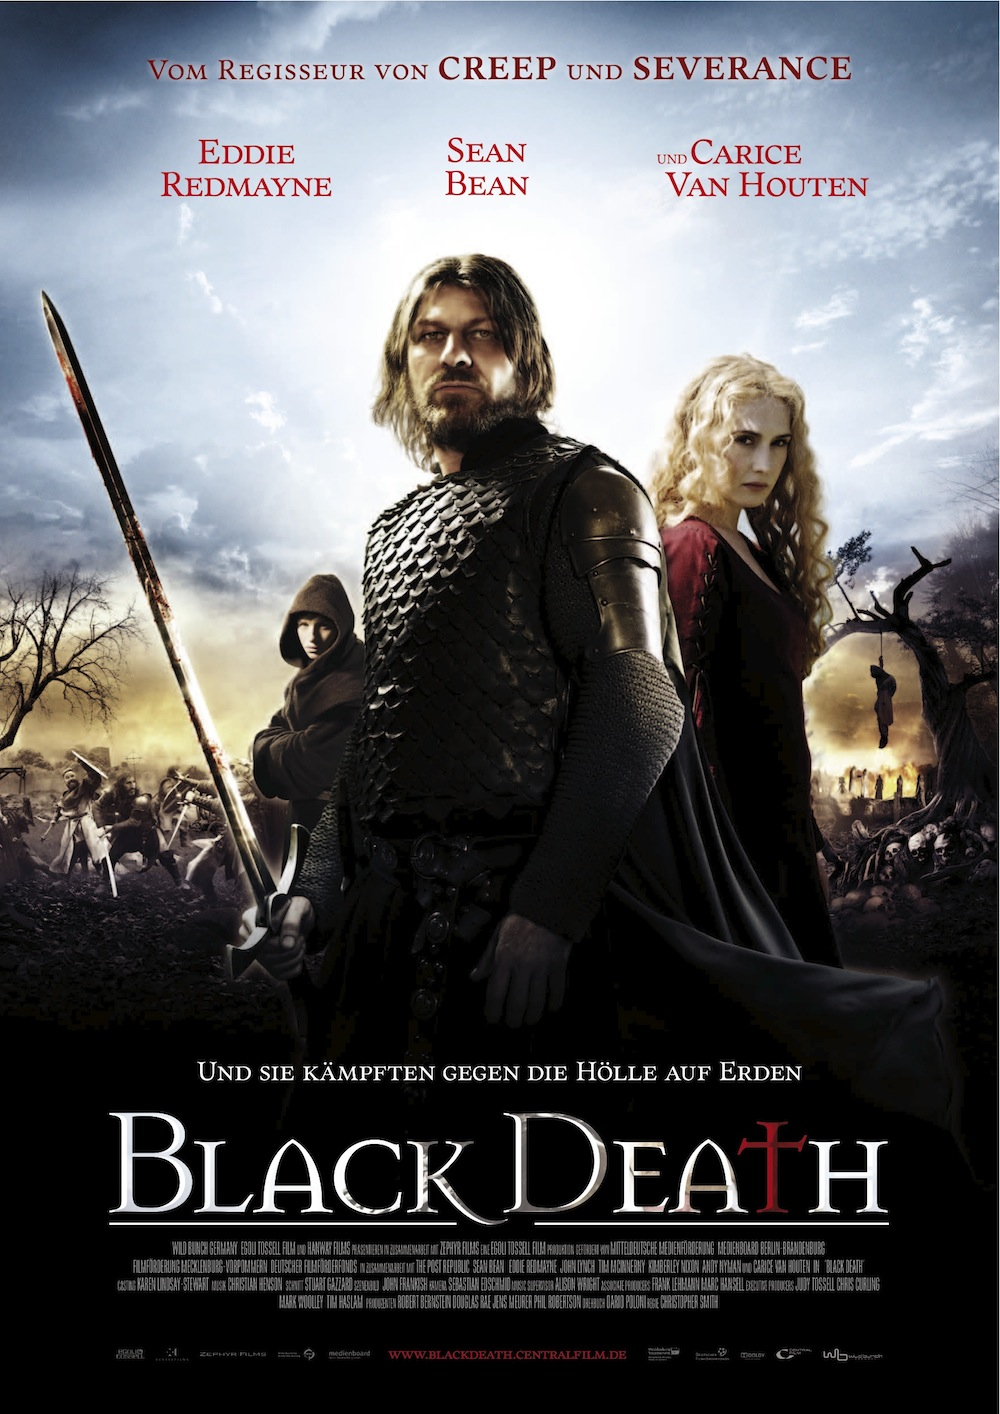 Ver Película Garra negra (Black death) Online (2010)